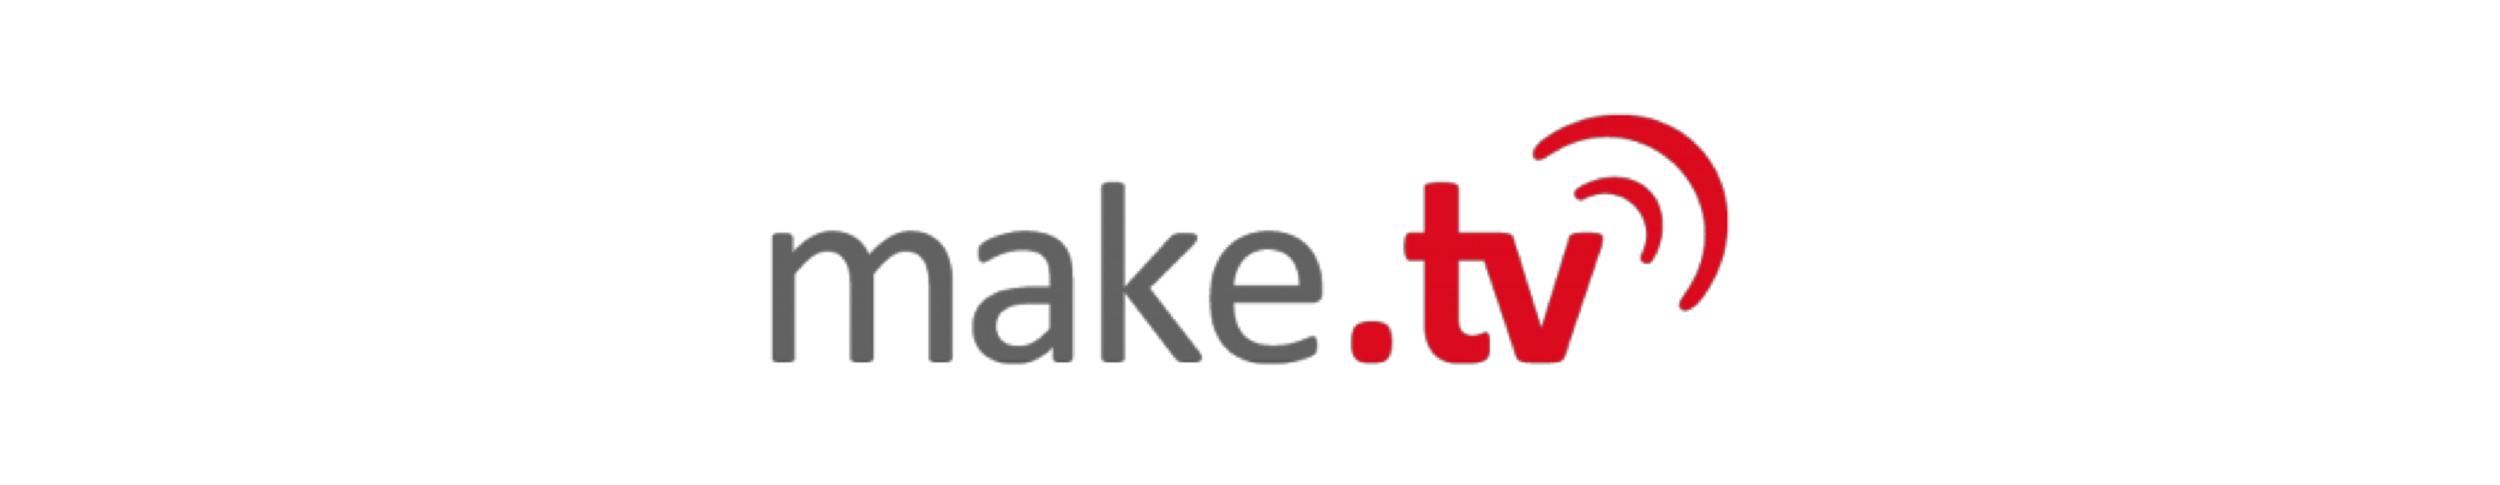 MakeTV (1040-2).png